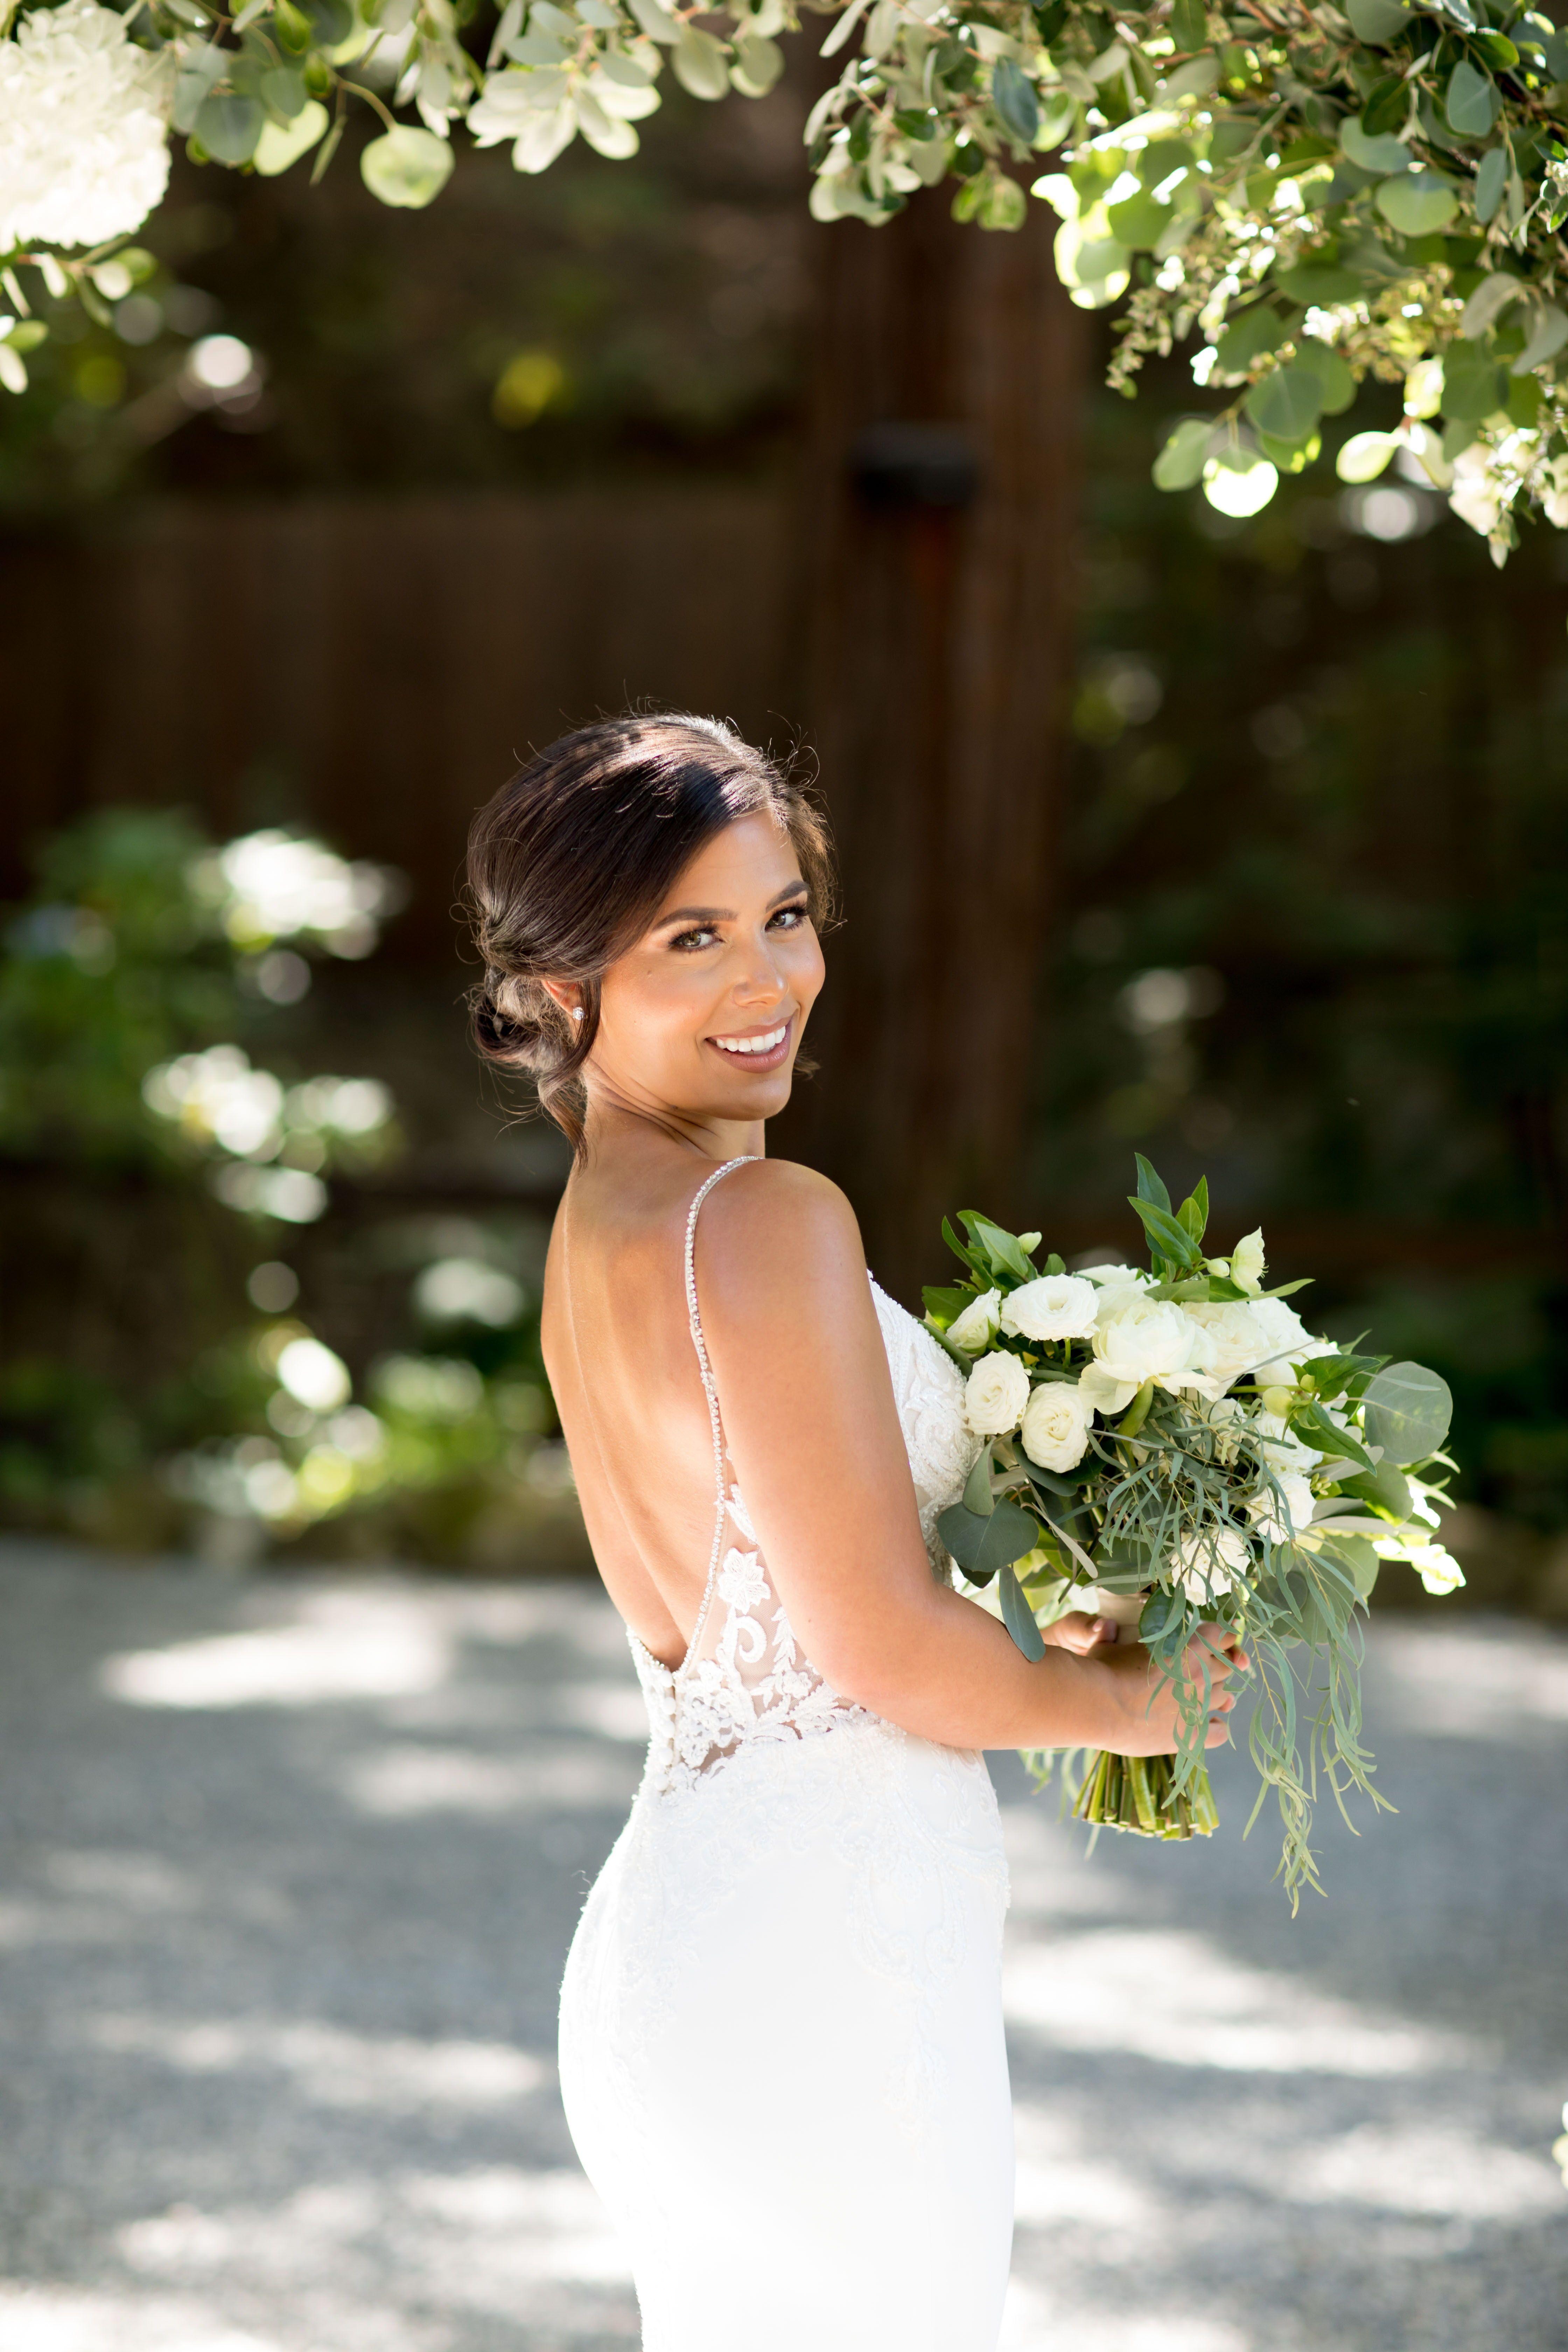 Deer park villa wedding photos in 2020 county wedding